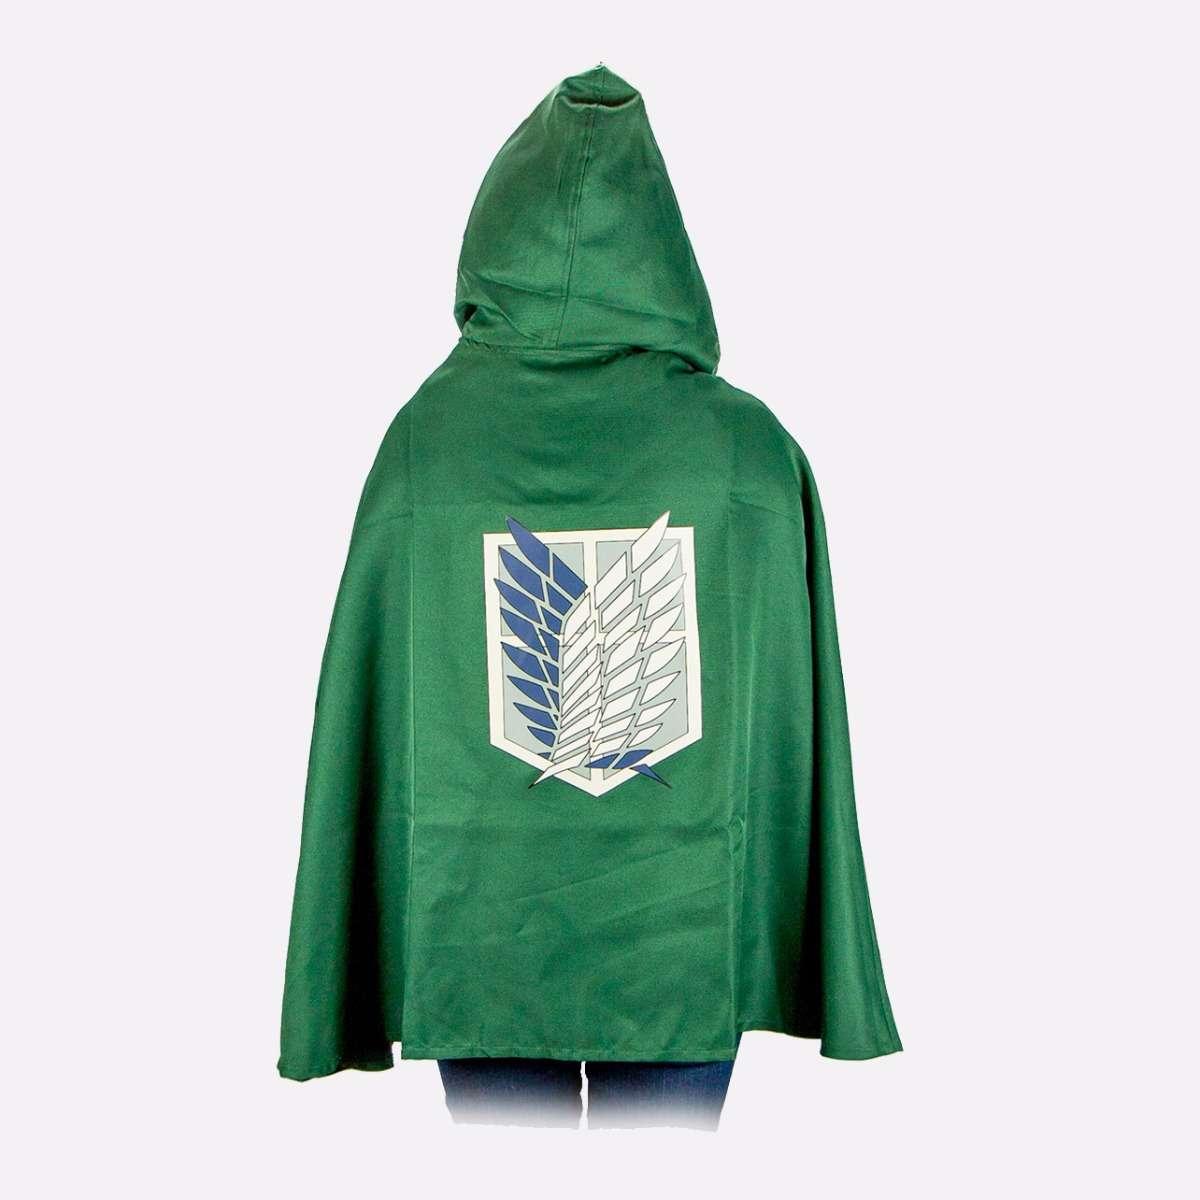 Scouting Legion Hooded Cloak apparel